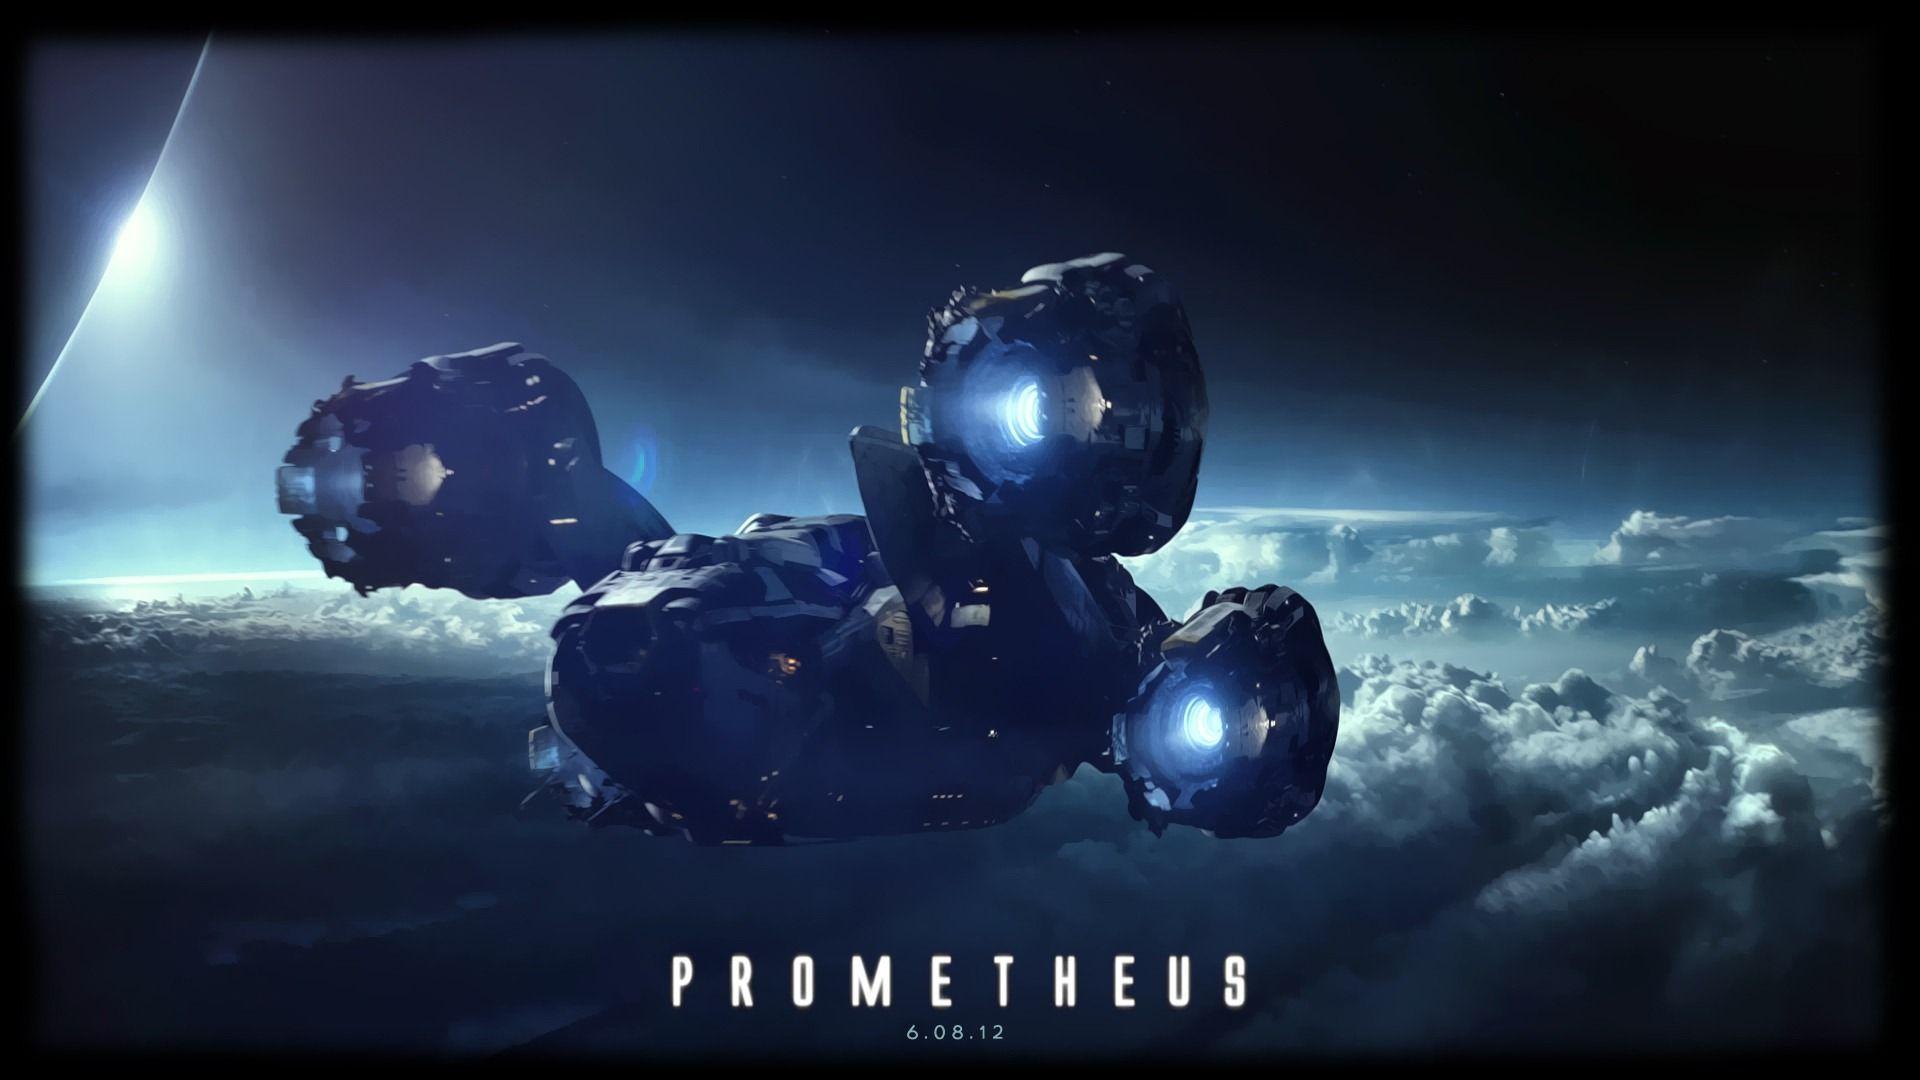 Pormetheus Wallpaper - Prometheus (2012 film) Wallpaper ...2012 Movie Wallpaper